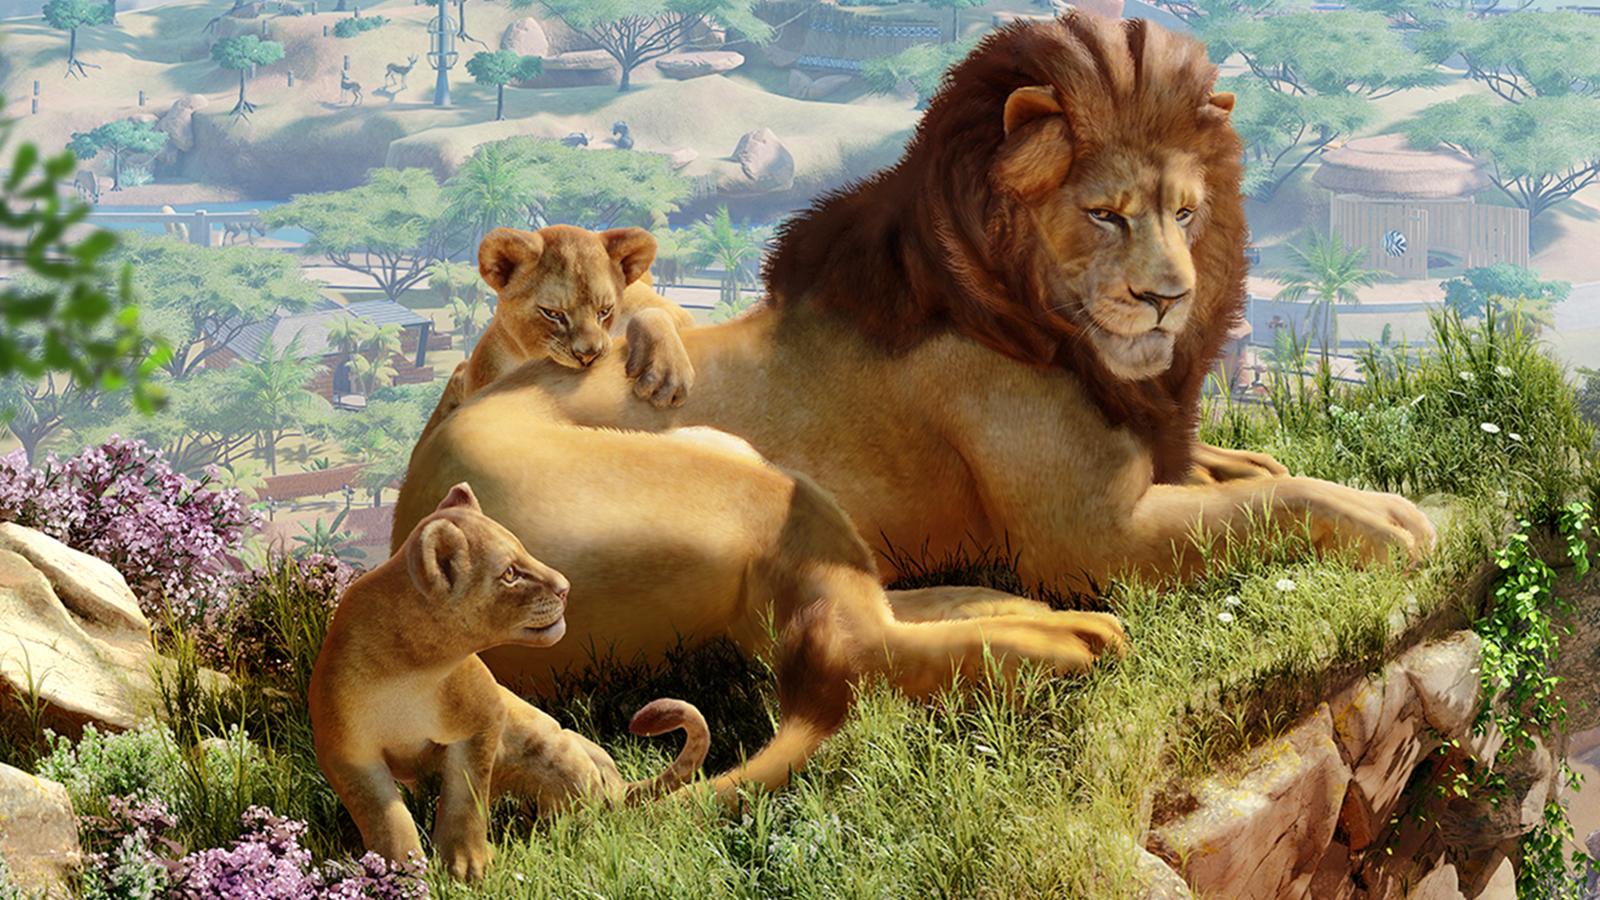 planet zoo lions wallpaper 68844